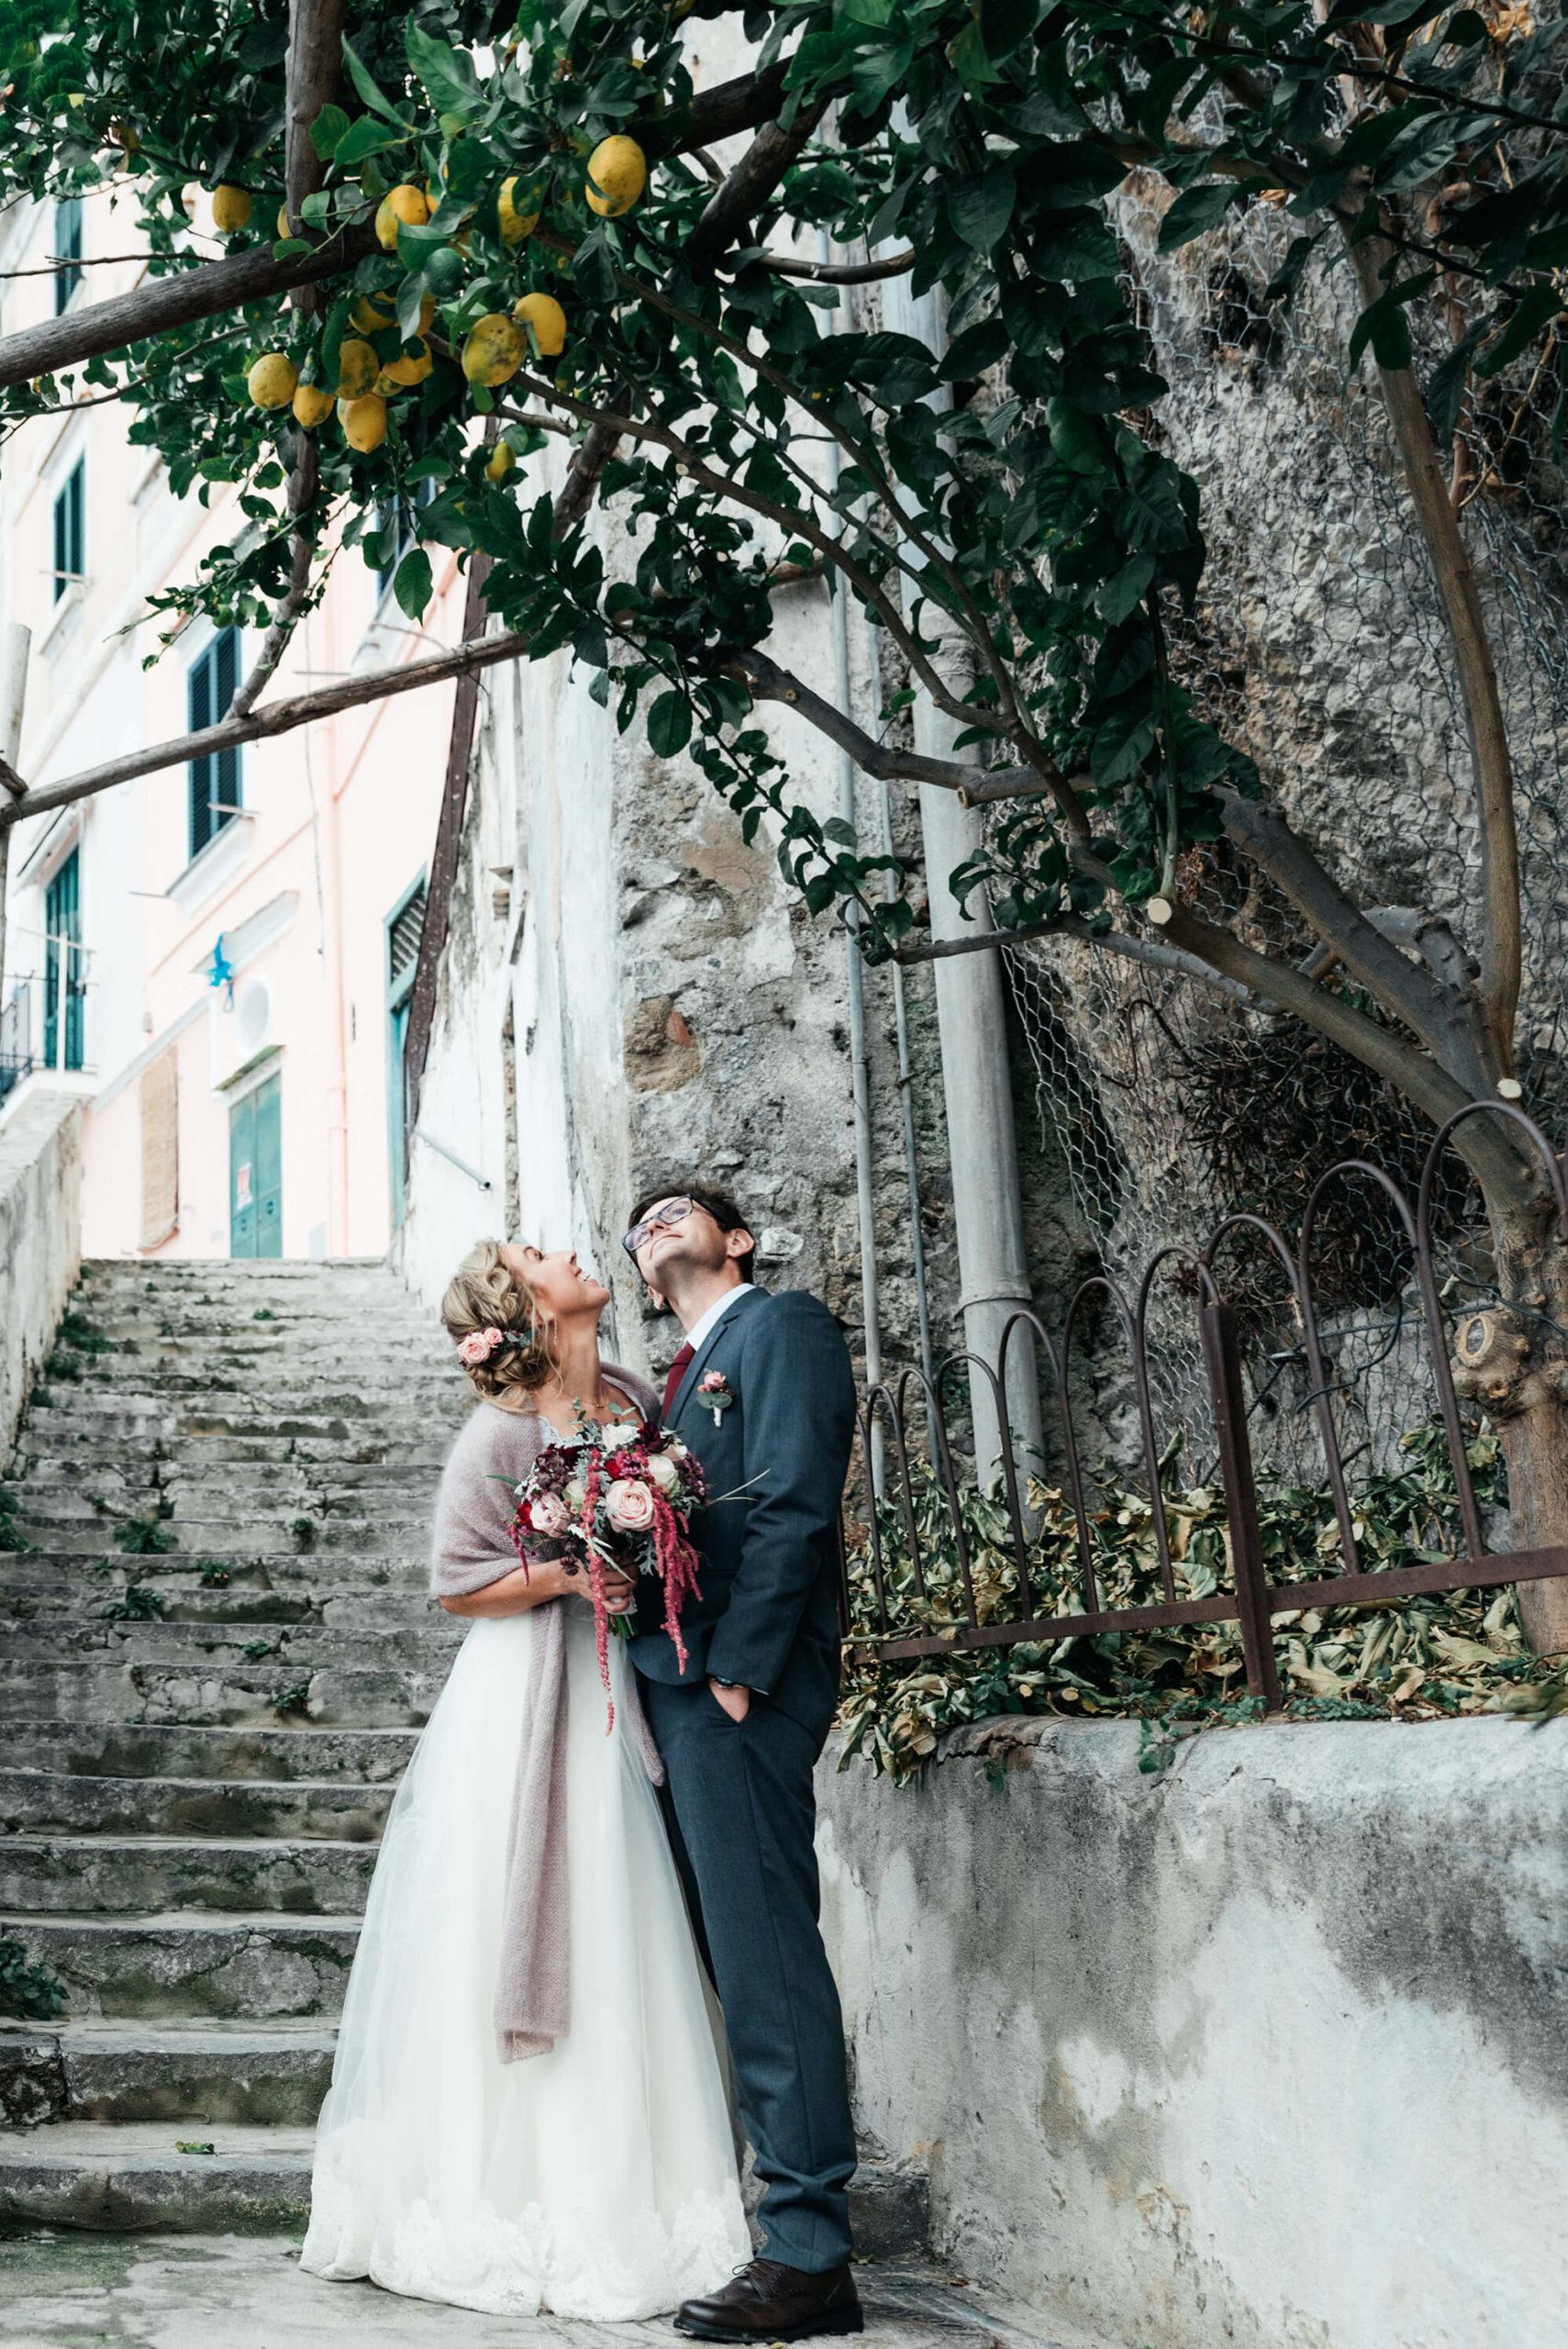 Autumn elopement in Italy (2)